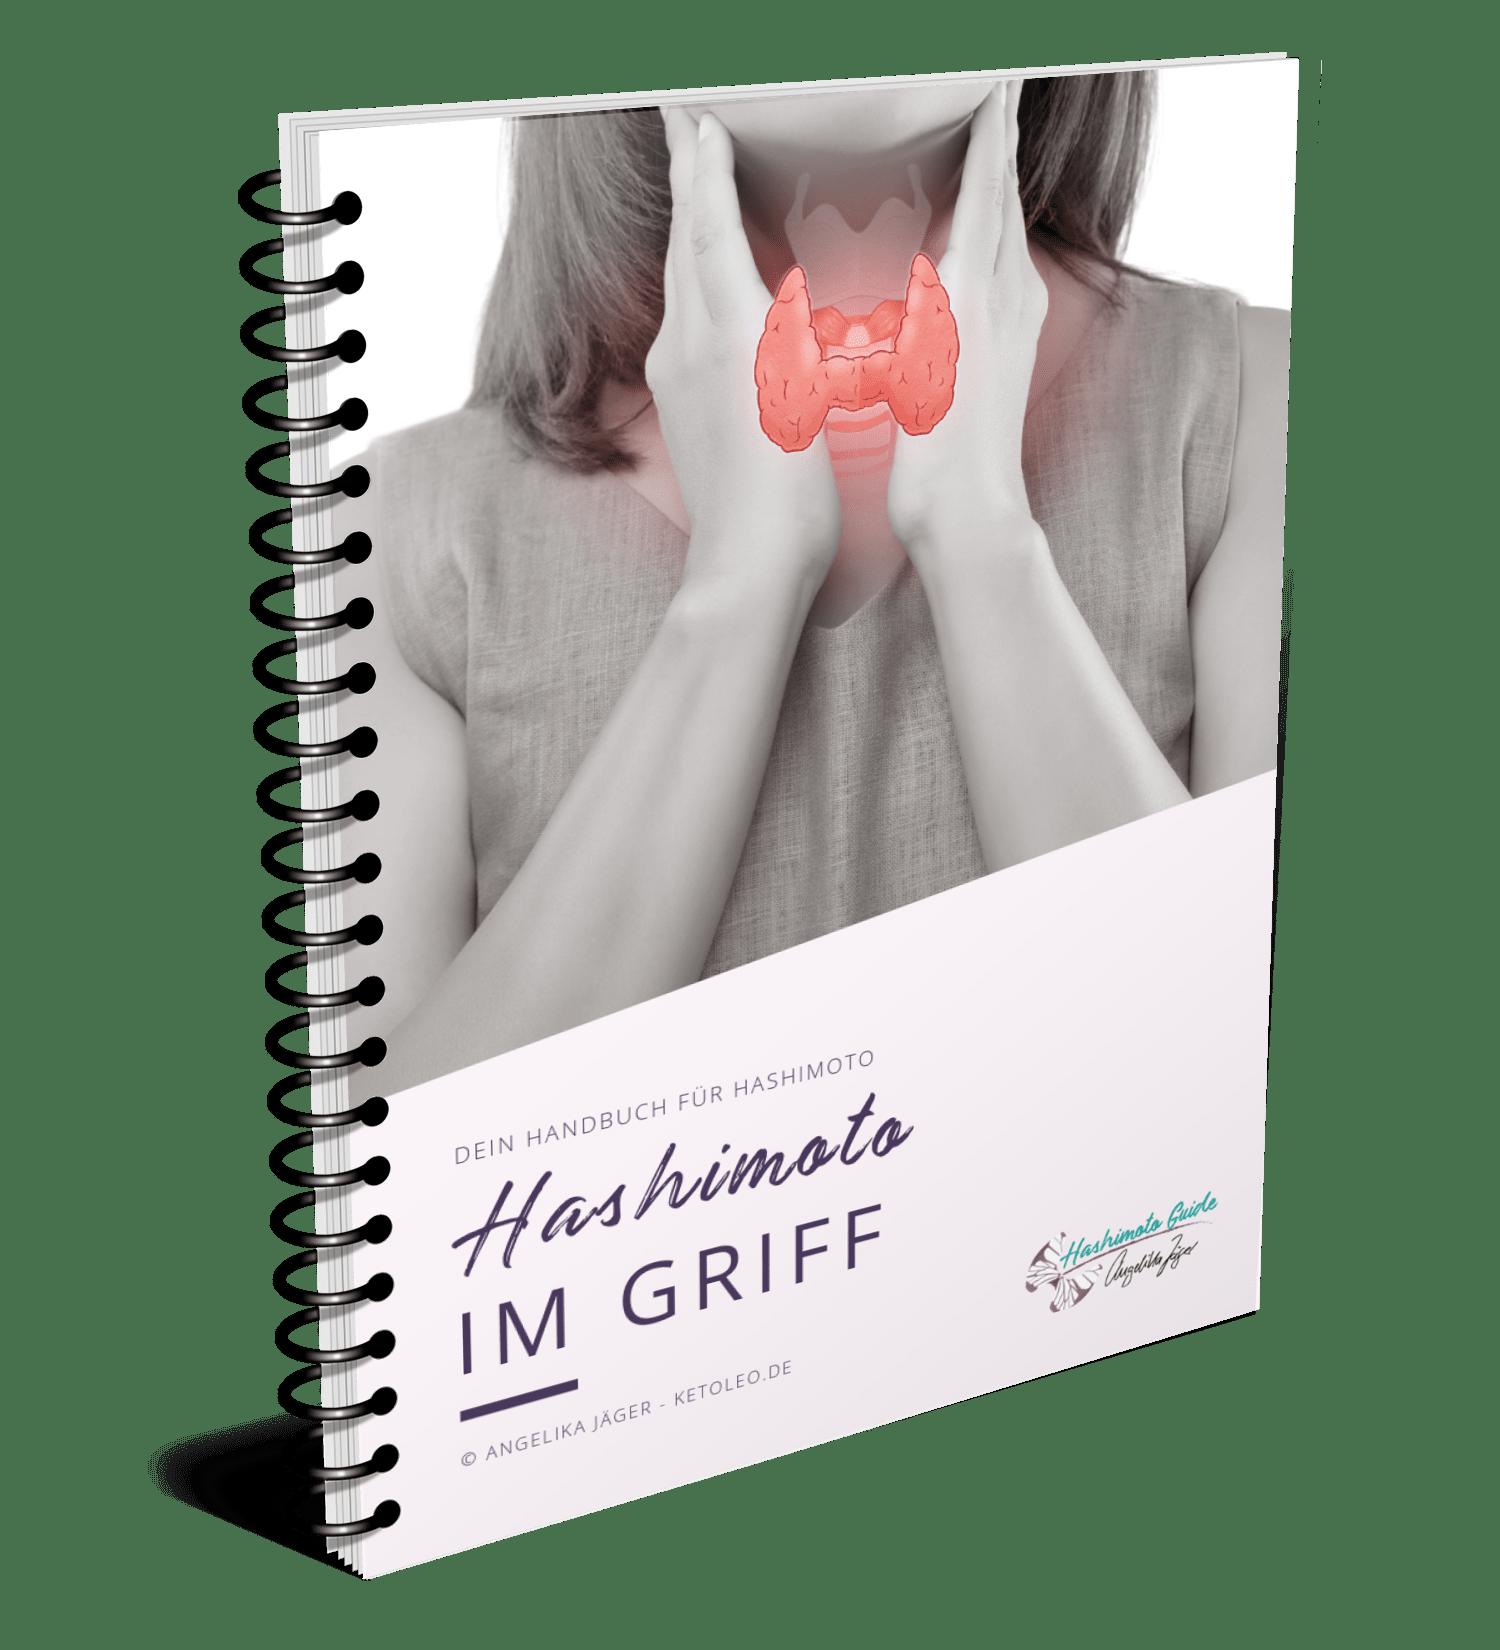 hashimoto-handbuch